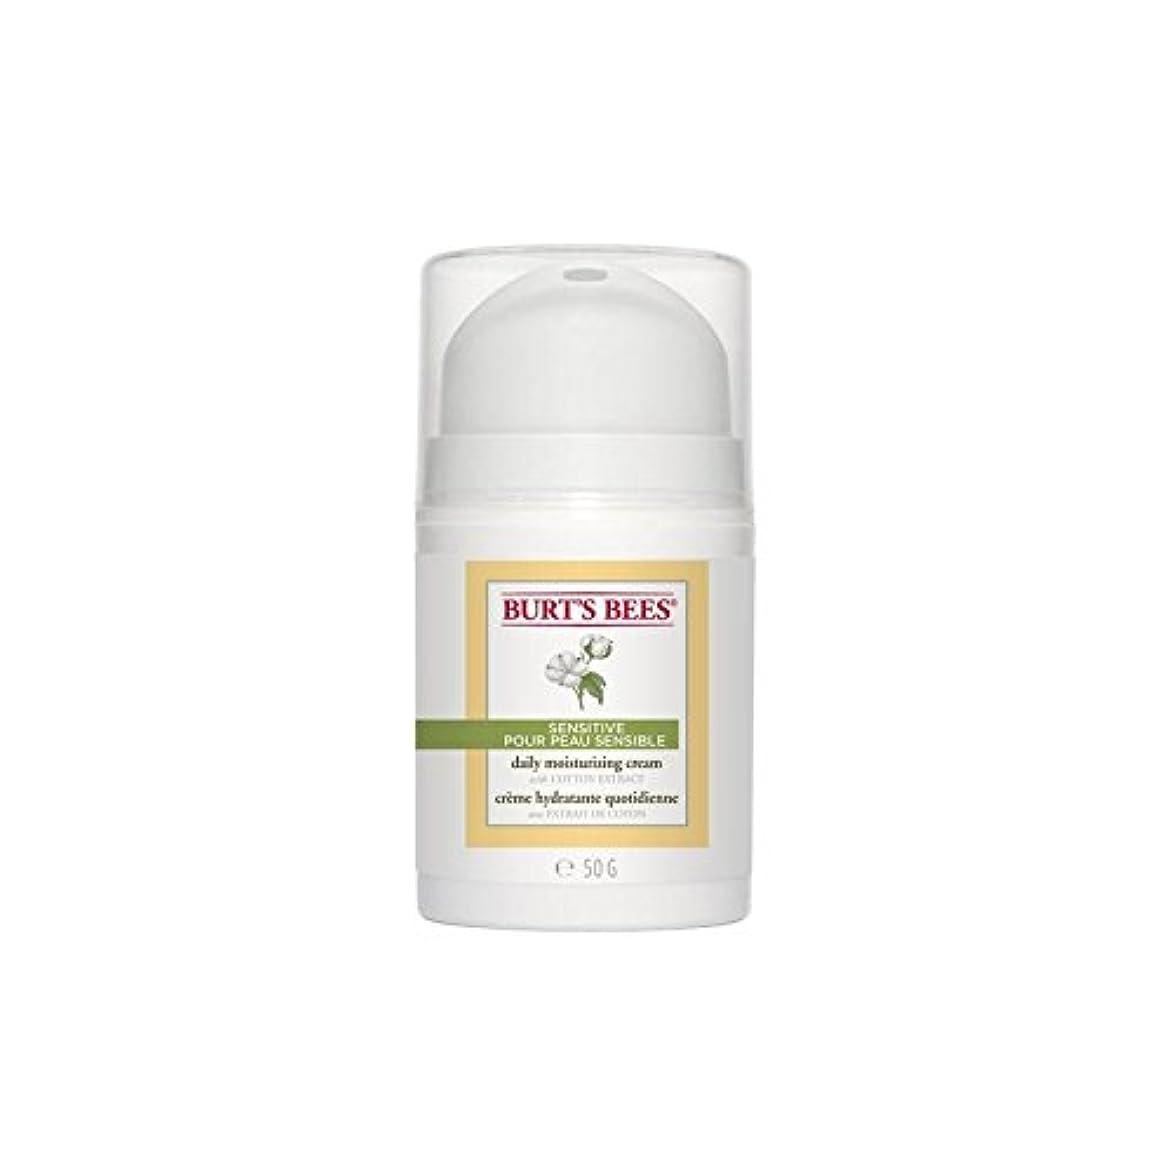 Burt's Bees Sensitive Daily Moisturising Cream 50G (Pack of 6) - バーツビー敏感毎日保湿クリーム50グラム x6 [並行輸入品]